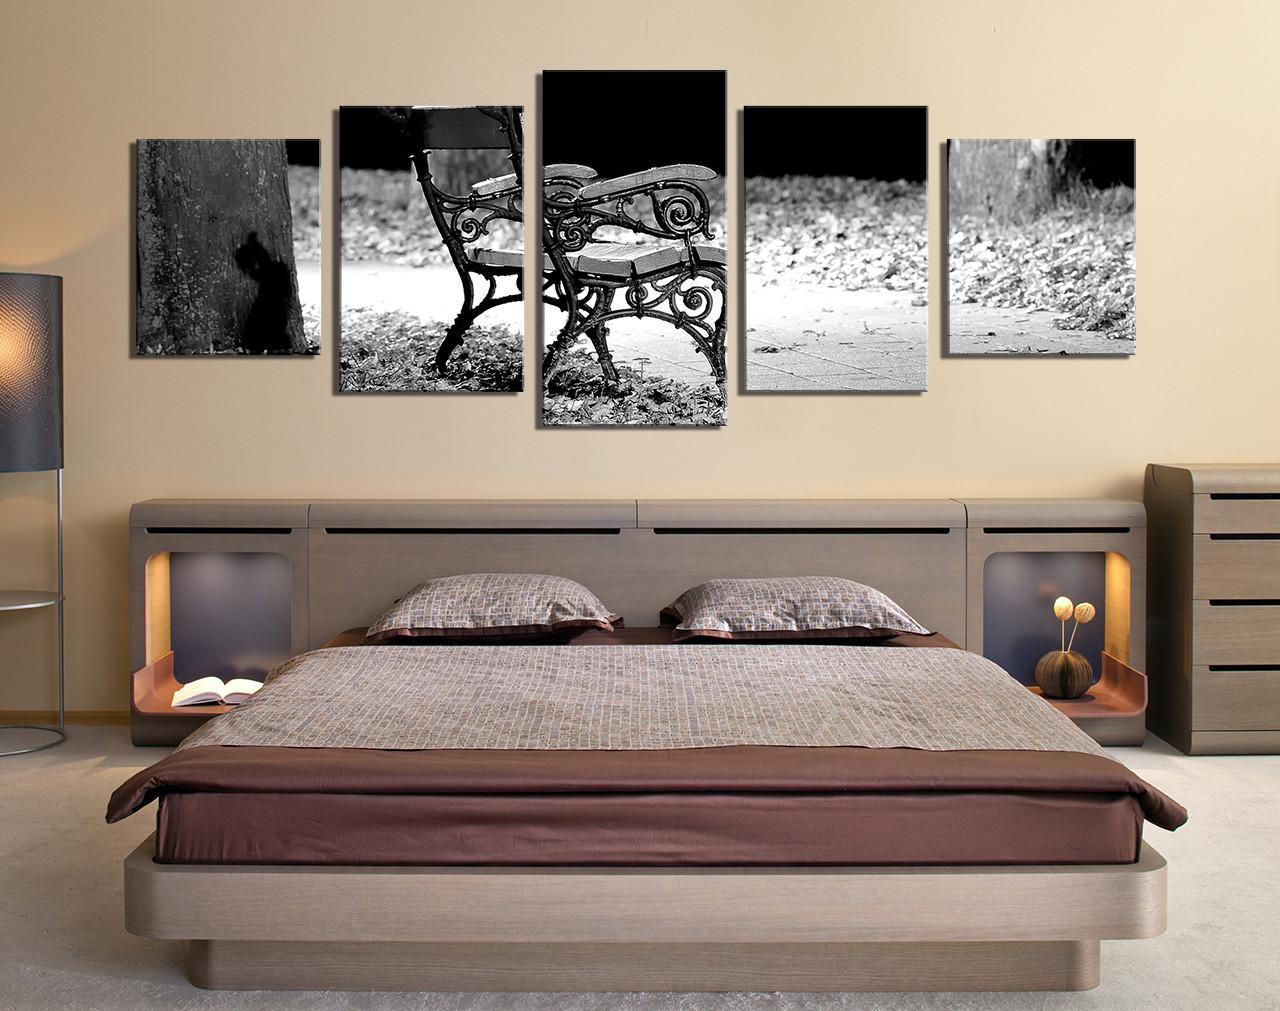 5 piece multi panel art bedroom large canvas modern canvas wall art grey